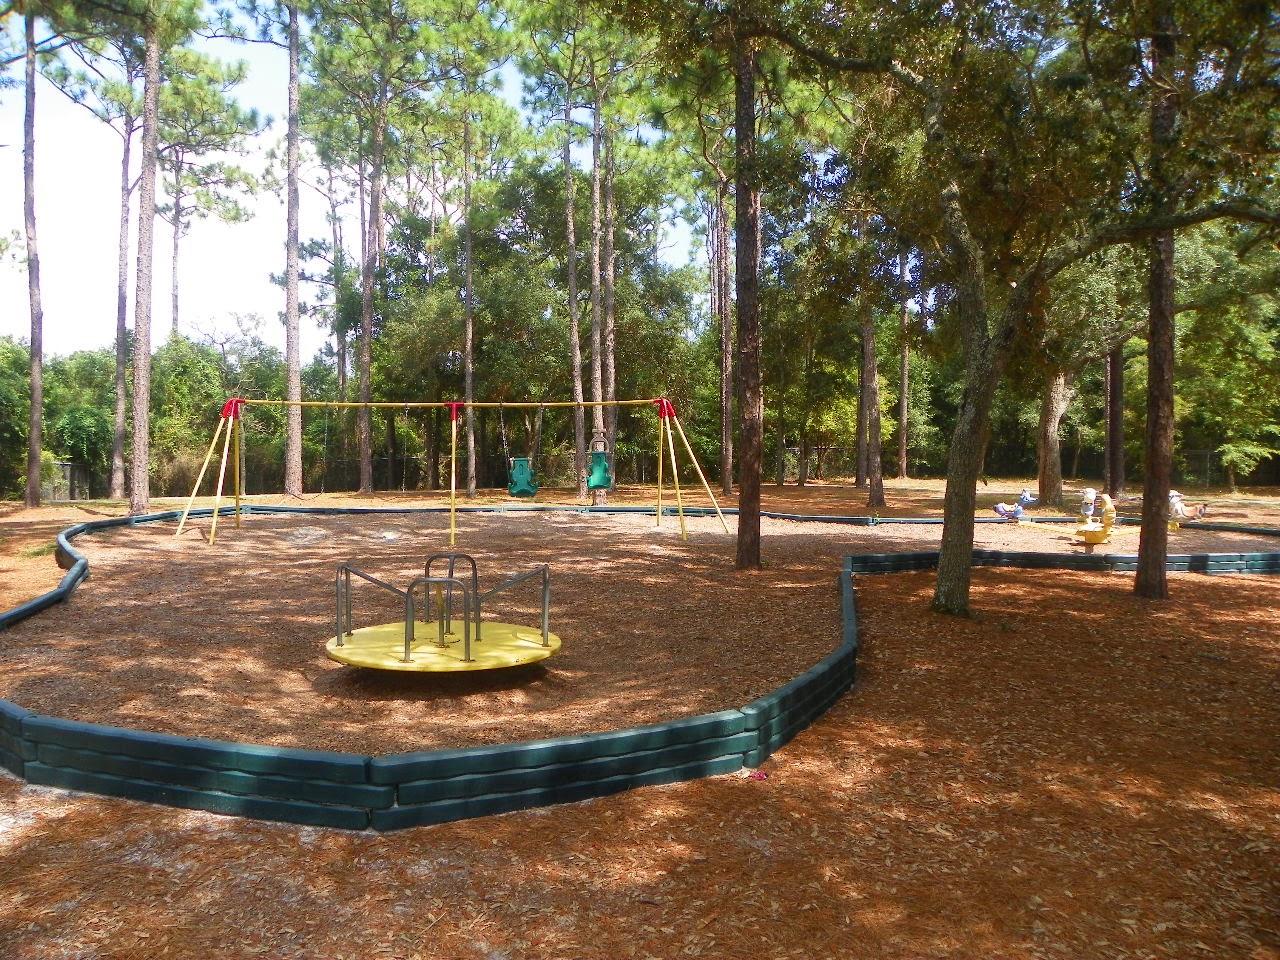 Lavallet Park in Pensacola, FL 32504